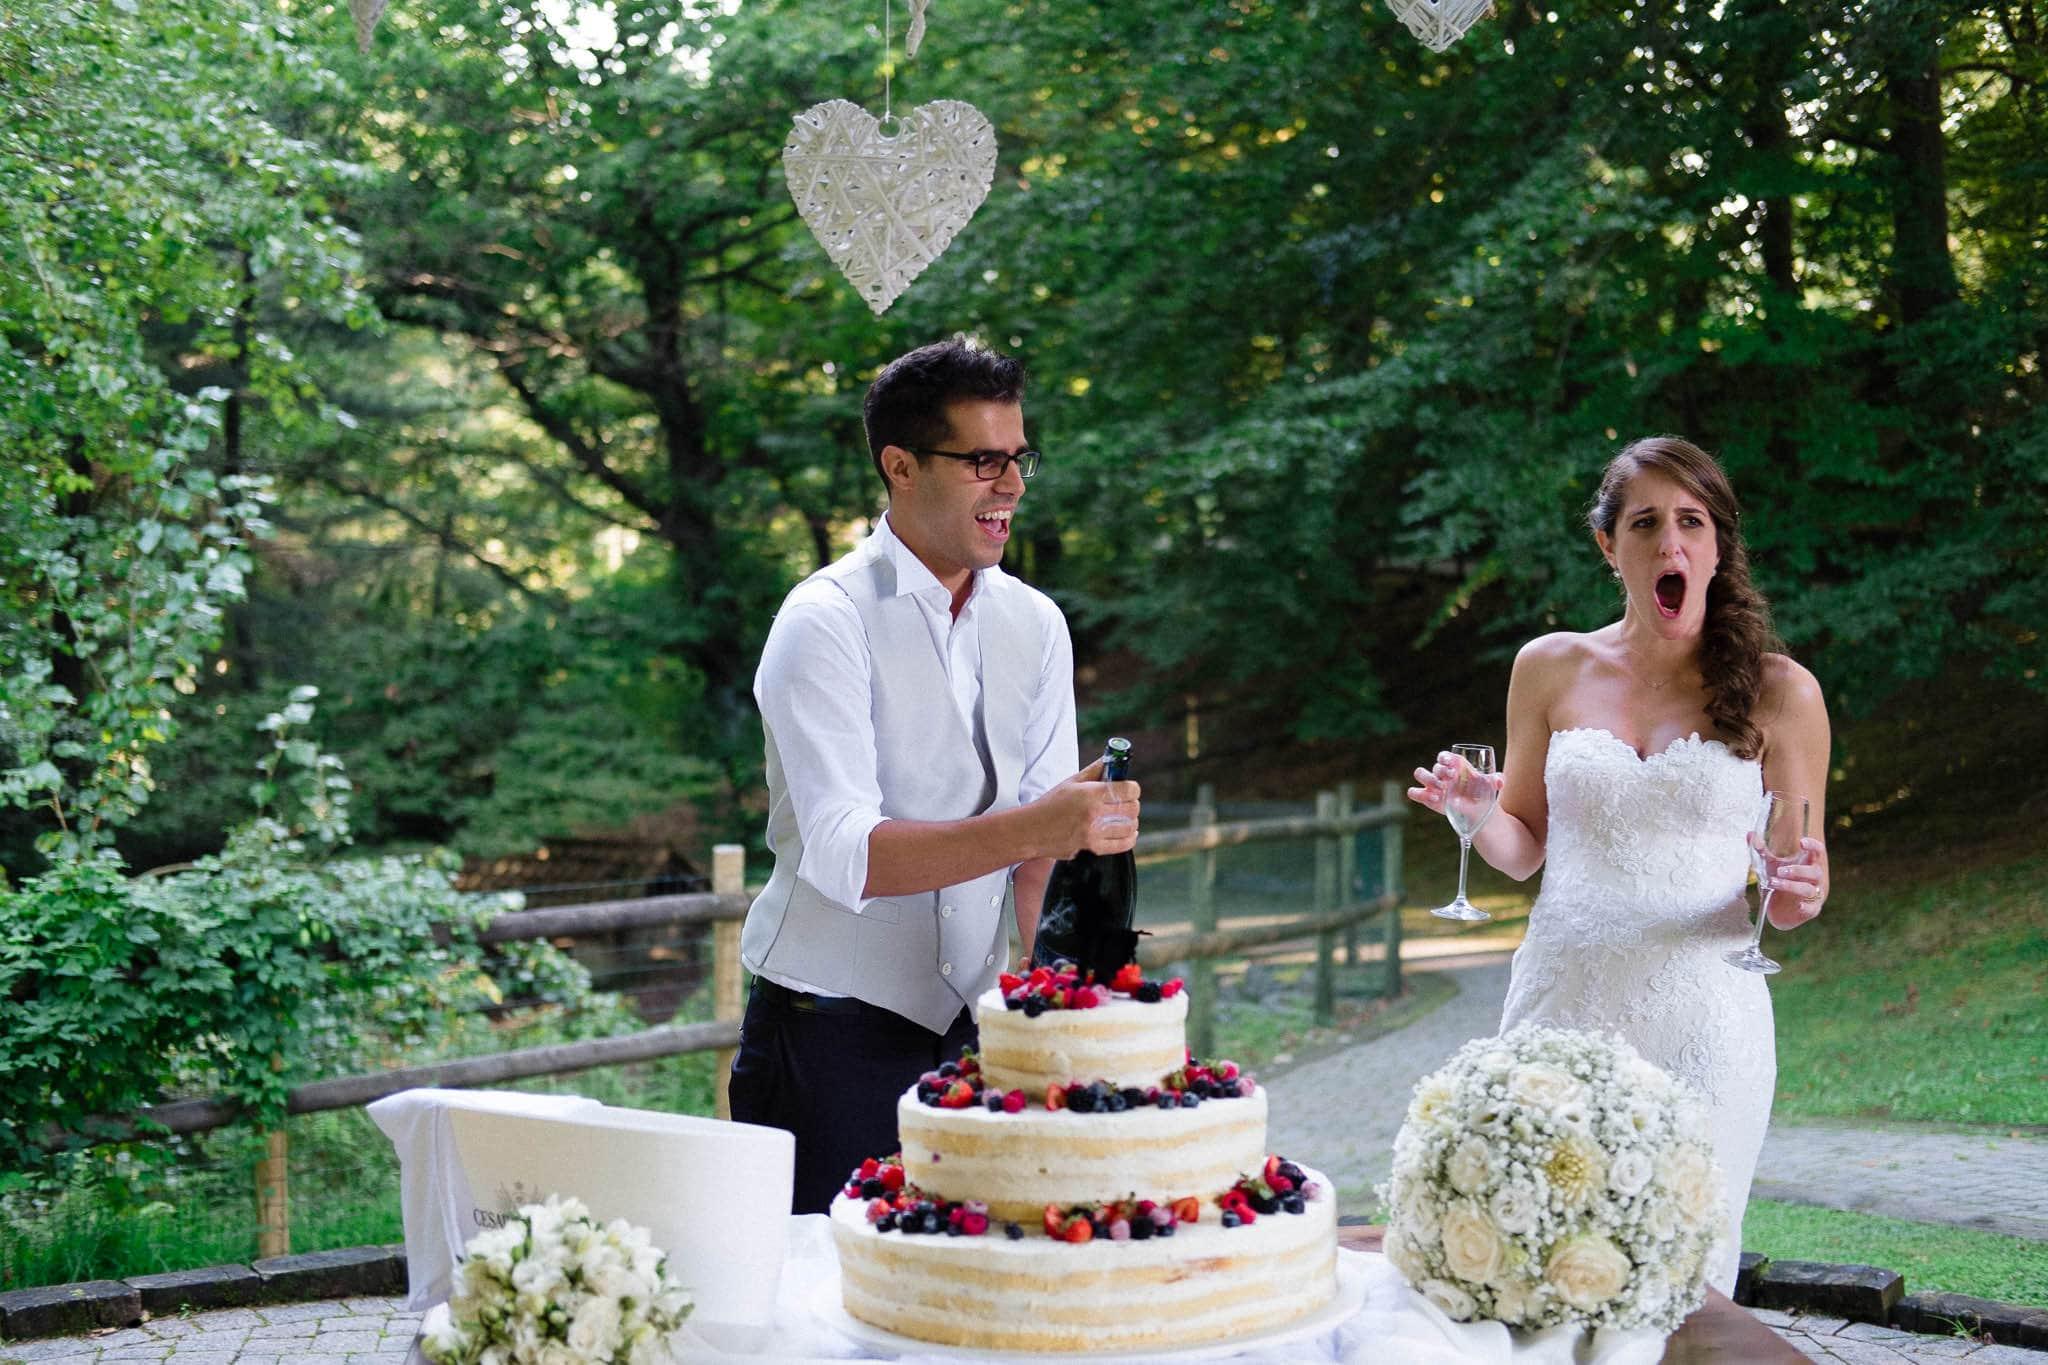 fotografo matrimonio cascina diodona varese lucarossifoto 00020